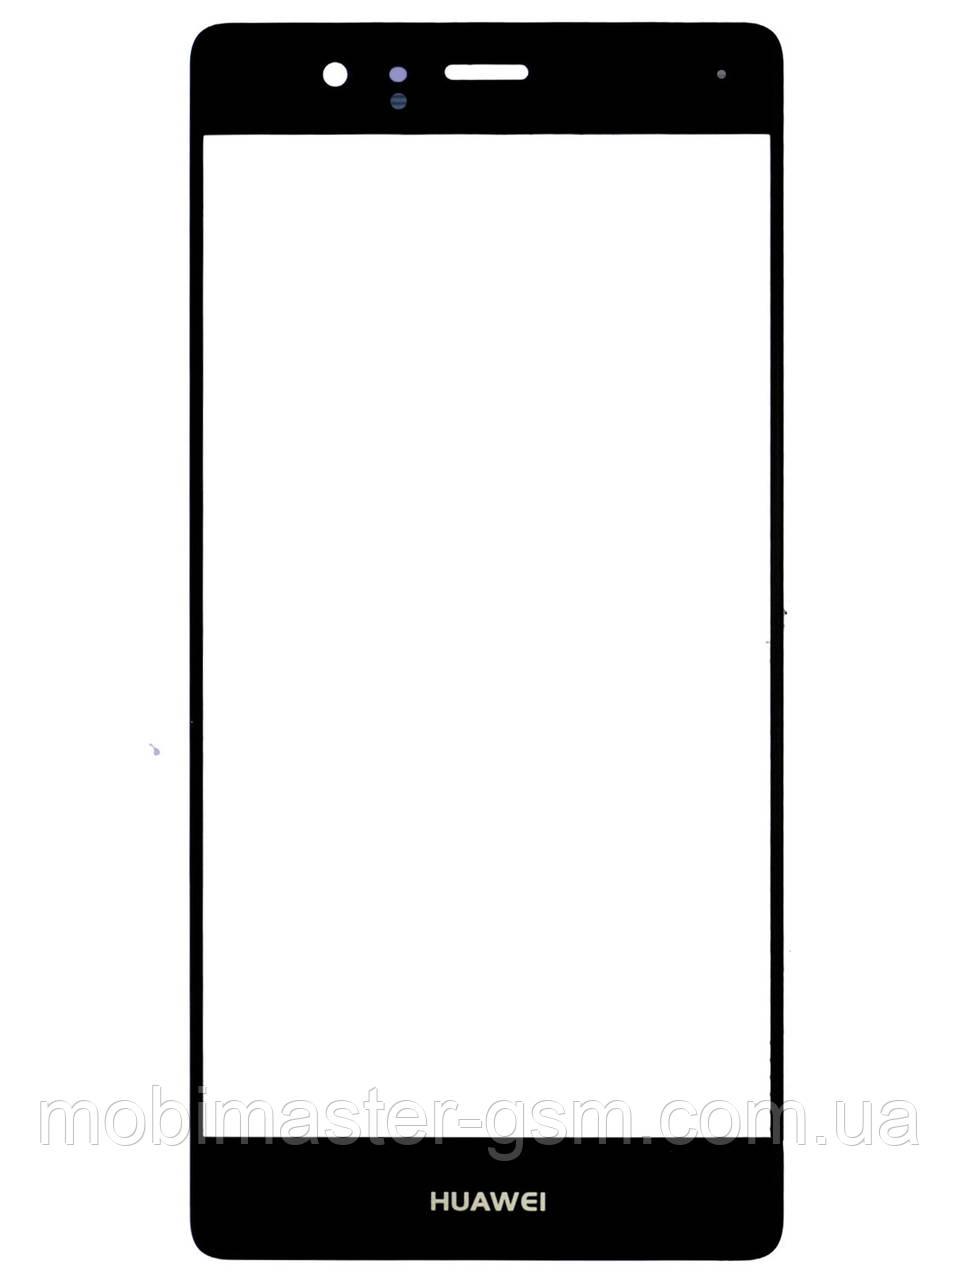 Корпусное стекло Huawei P9 Lite black